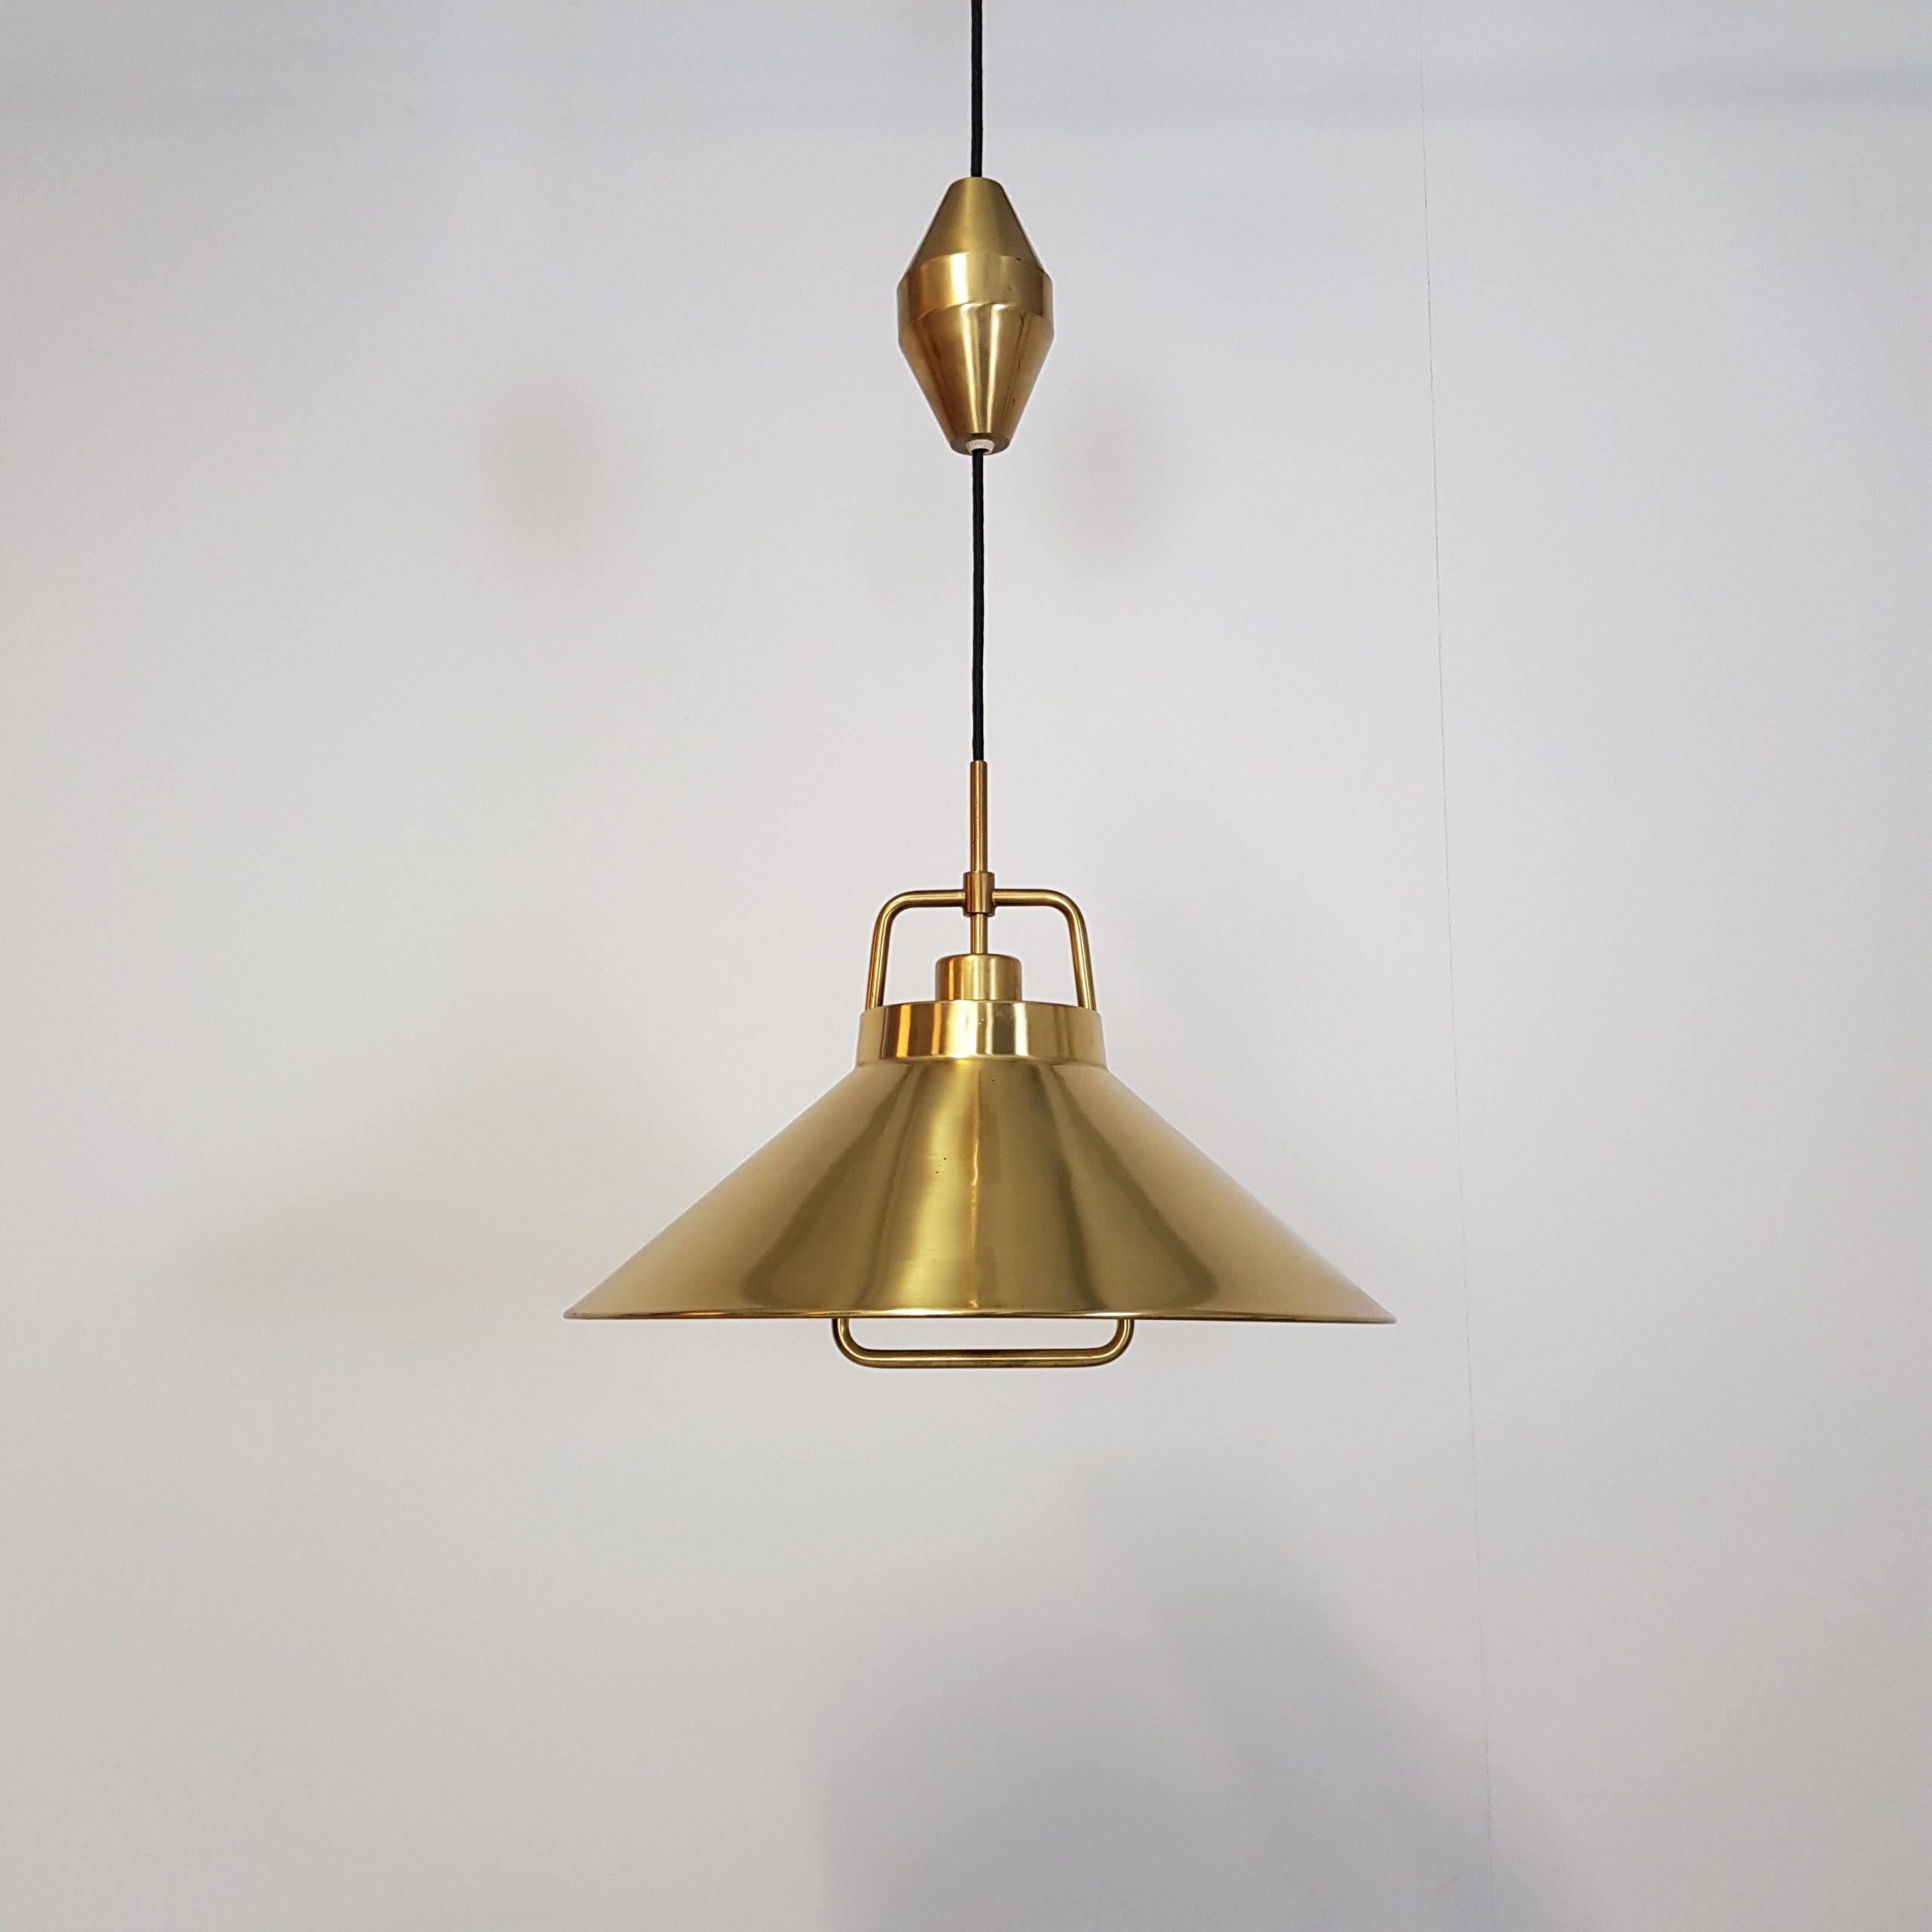 Pendel lampe   Messing   Retrofabrikken